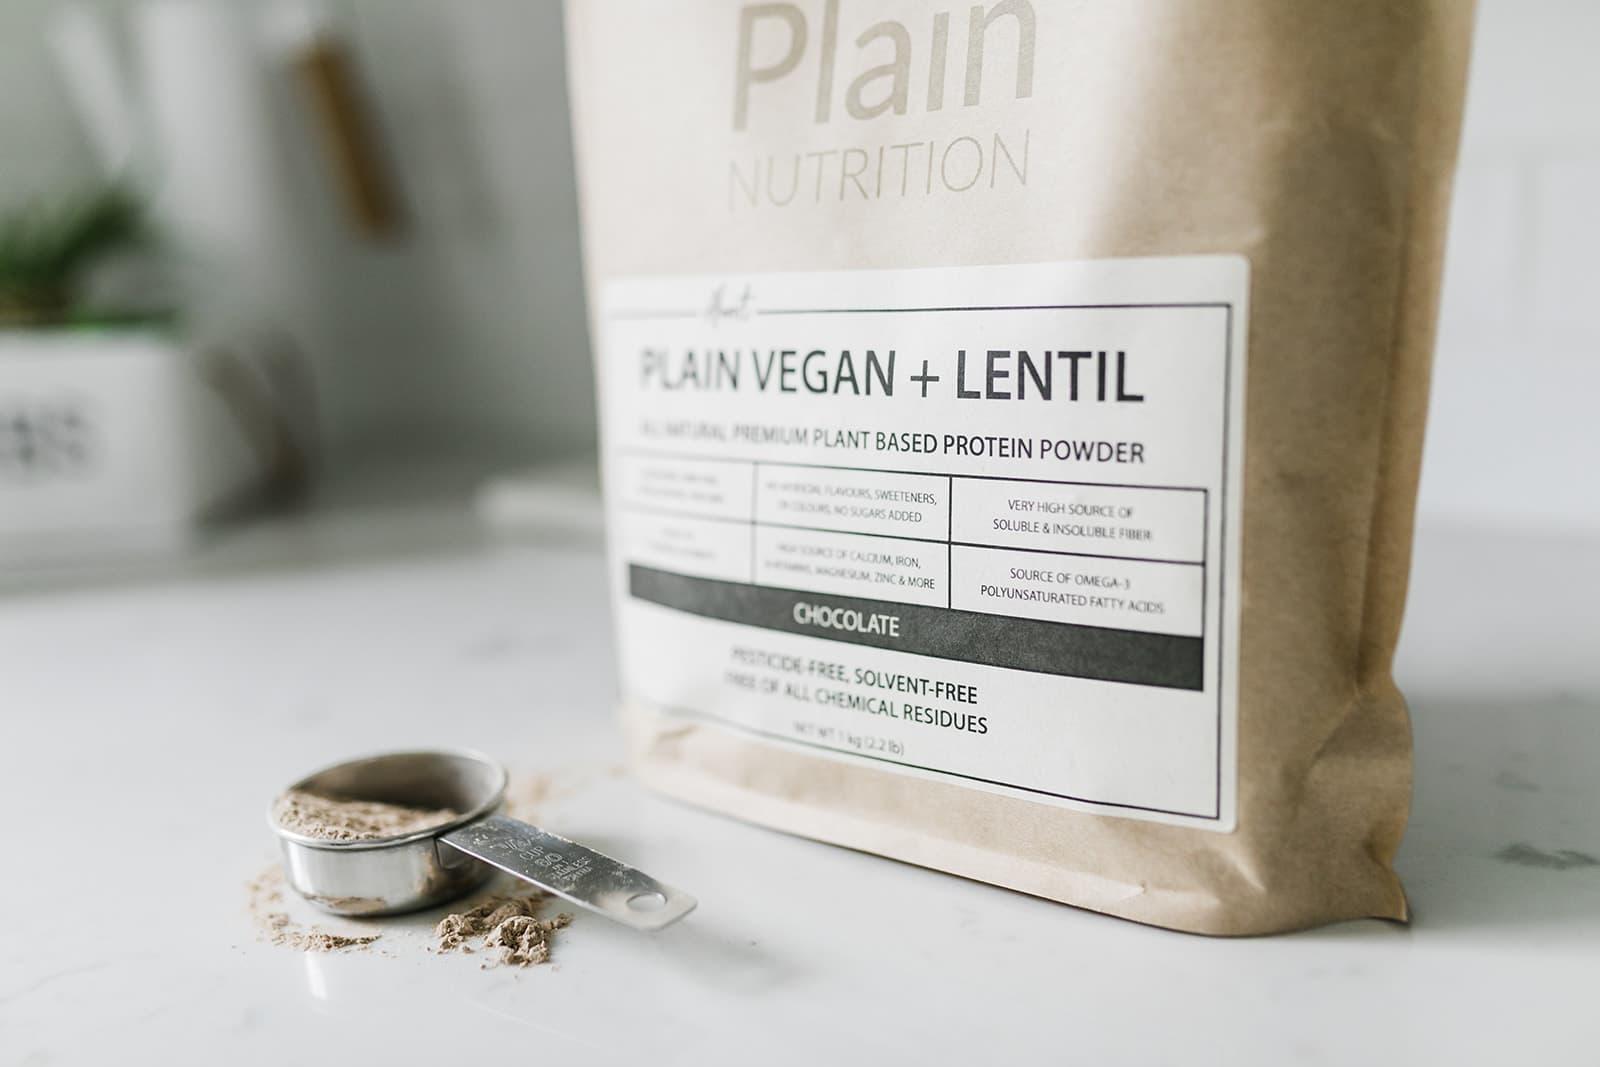 Water lentil protein